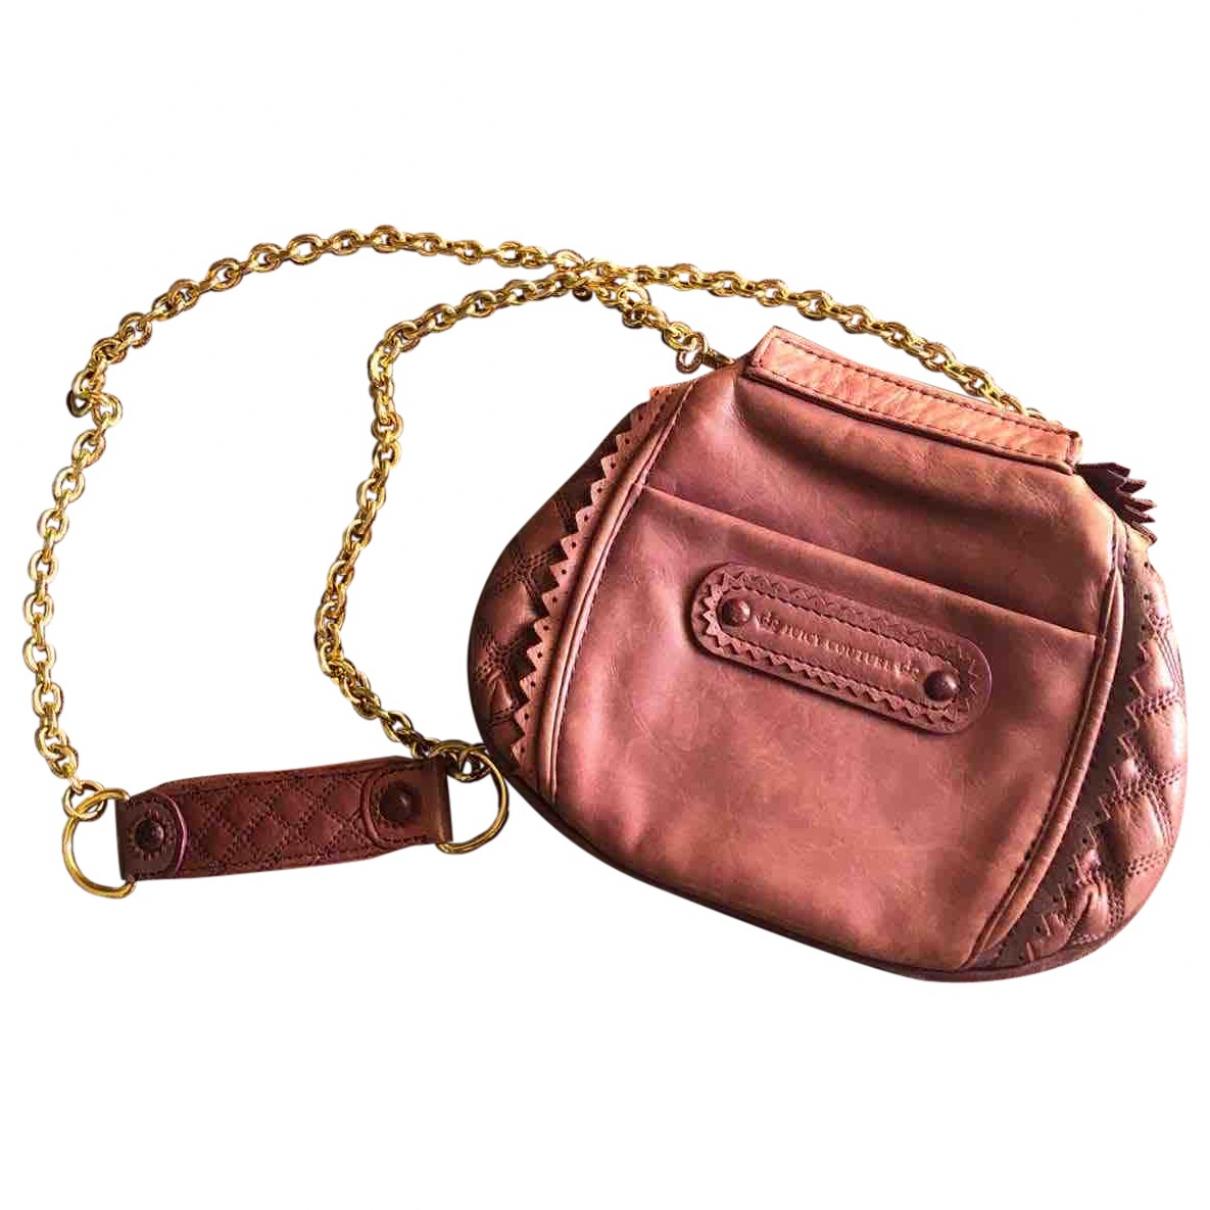 Juicy Couture \N Leather handbag for Women \N